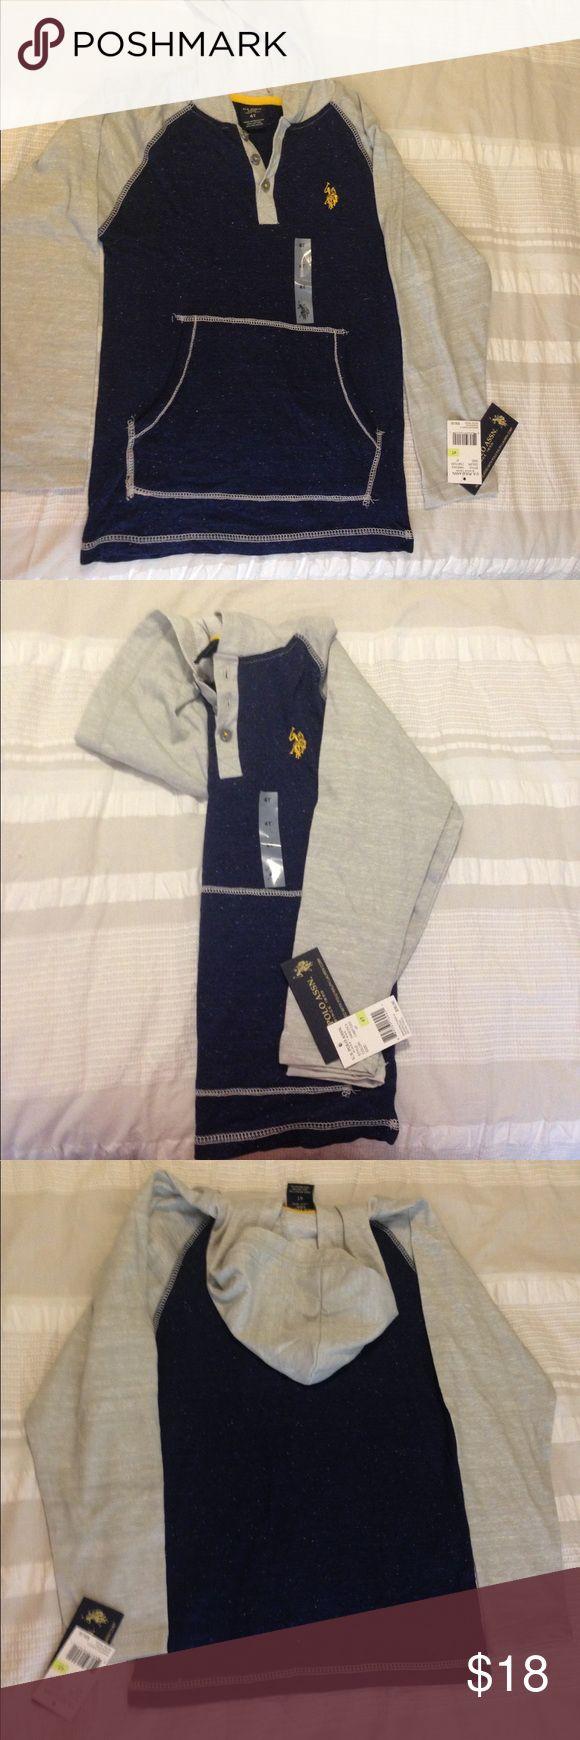 Polo Ralph Lauren-Long Slv Shirt -Grey/Navy -Sz 4T *NEW* with tags - Polo Ralph Lauren - Hooded Long Sleeve Shirt - Grey/Navy - Boys Size 4T Polo by Ralph Lauren Shirts & Tops Tees - Long Sleeve